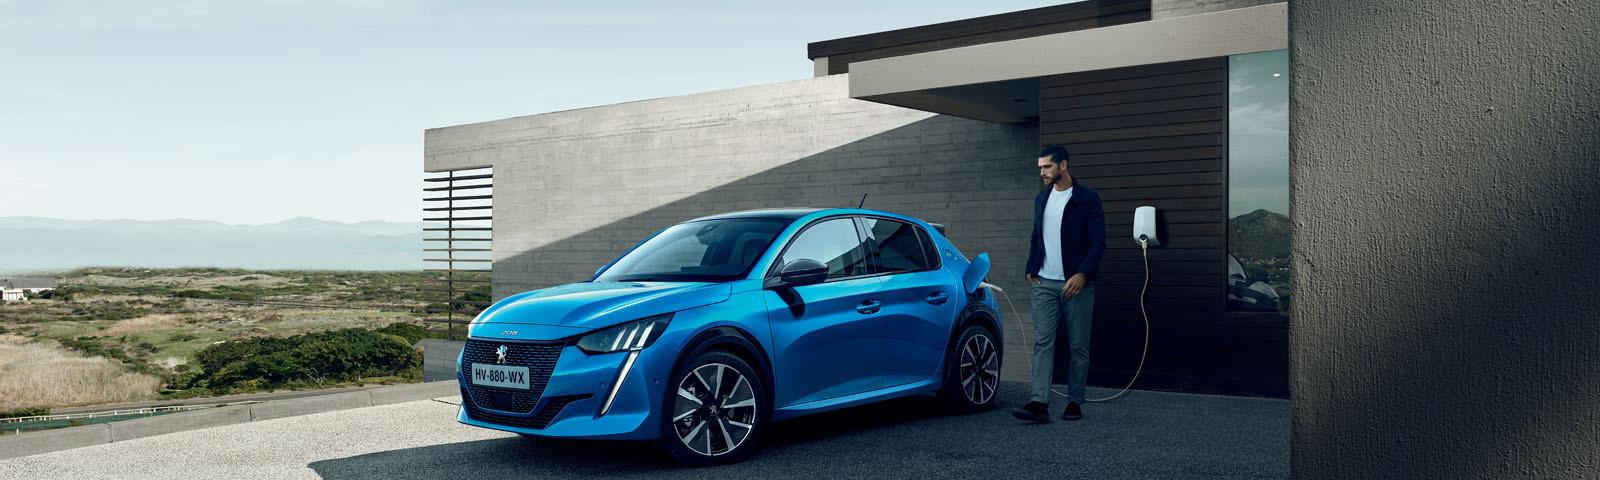 Los cinco ceros que definen al Peugeot e-208